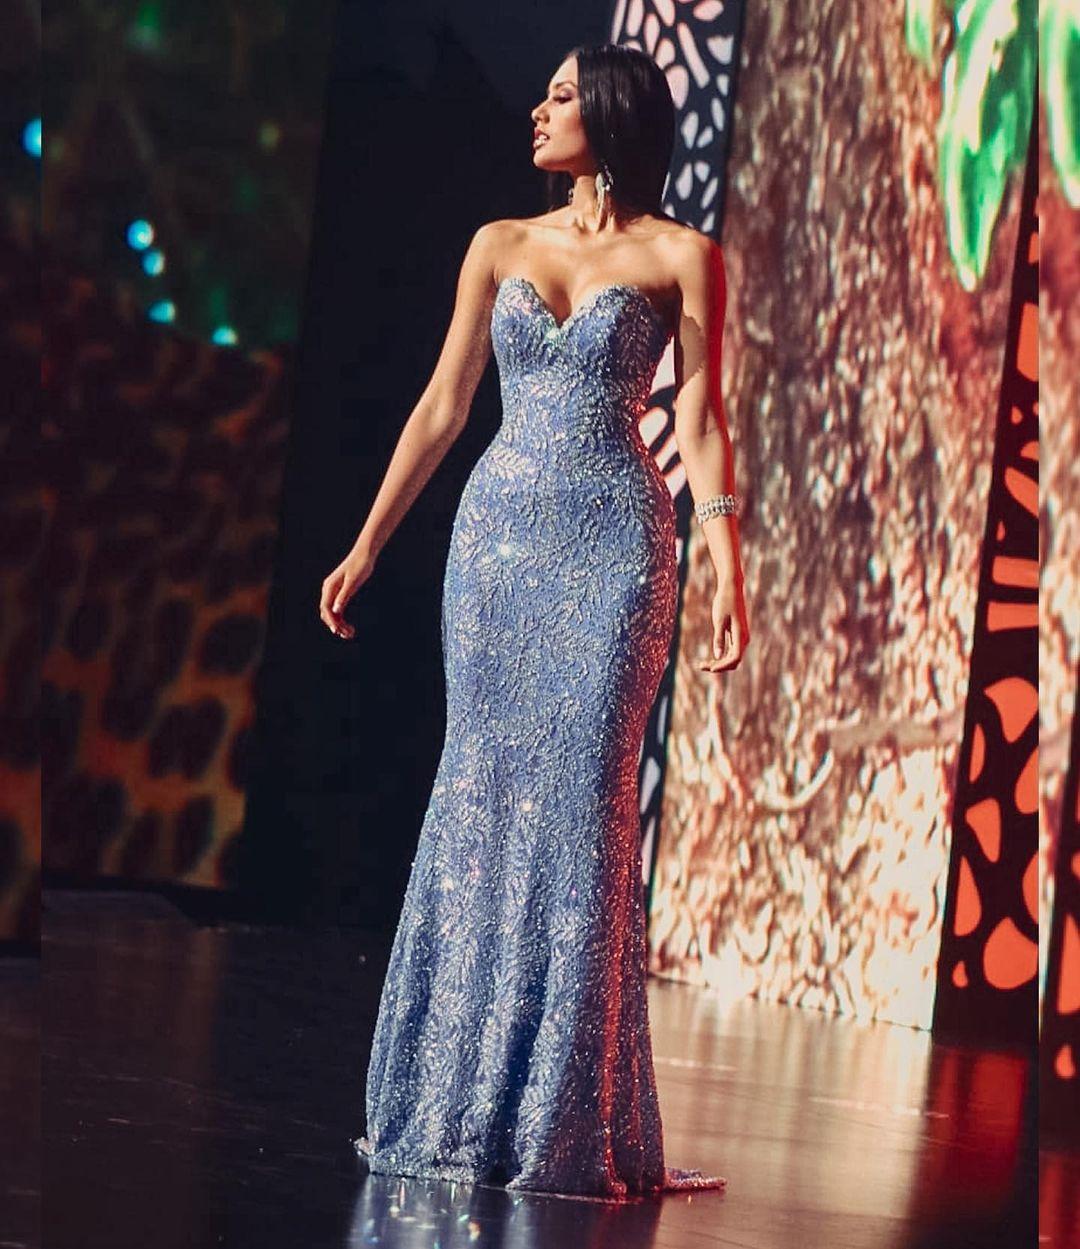 valentina aldana, miss supranational colombia 2021. 22765618